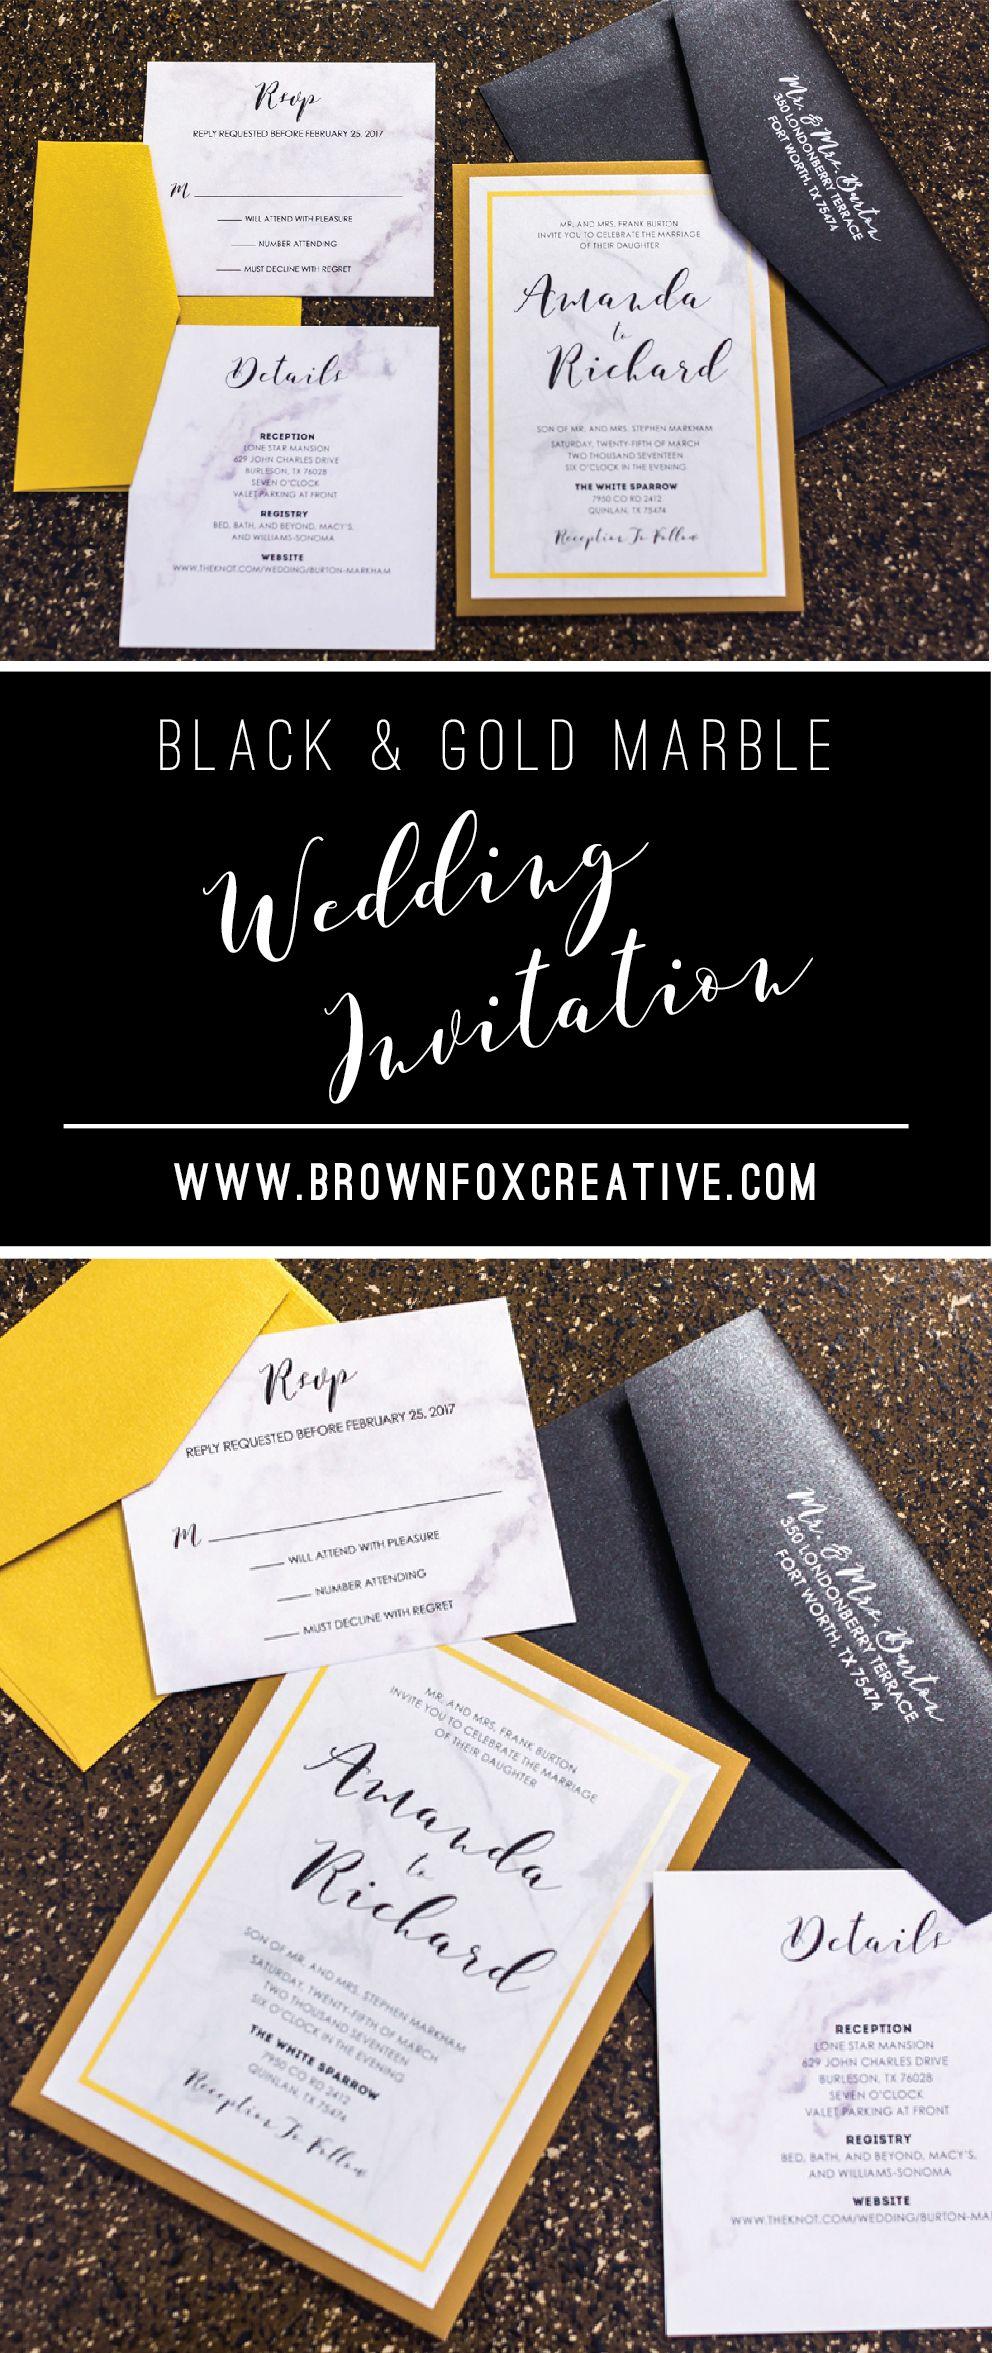 5x7 formal back pocket marble wedding invitation in black and gold 5x7 formal back pocket marble wedding invitation in black and gold includes 2 inserts and stopboris Gallery